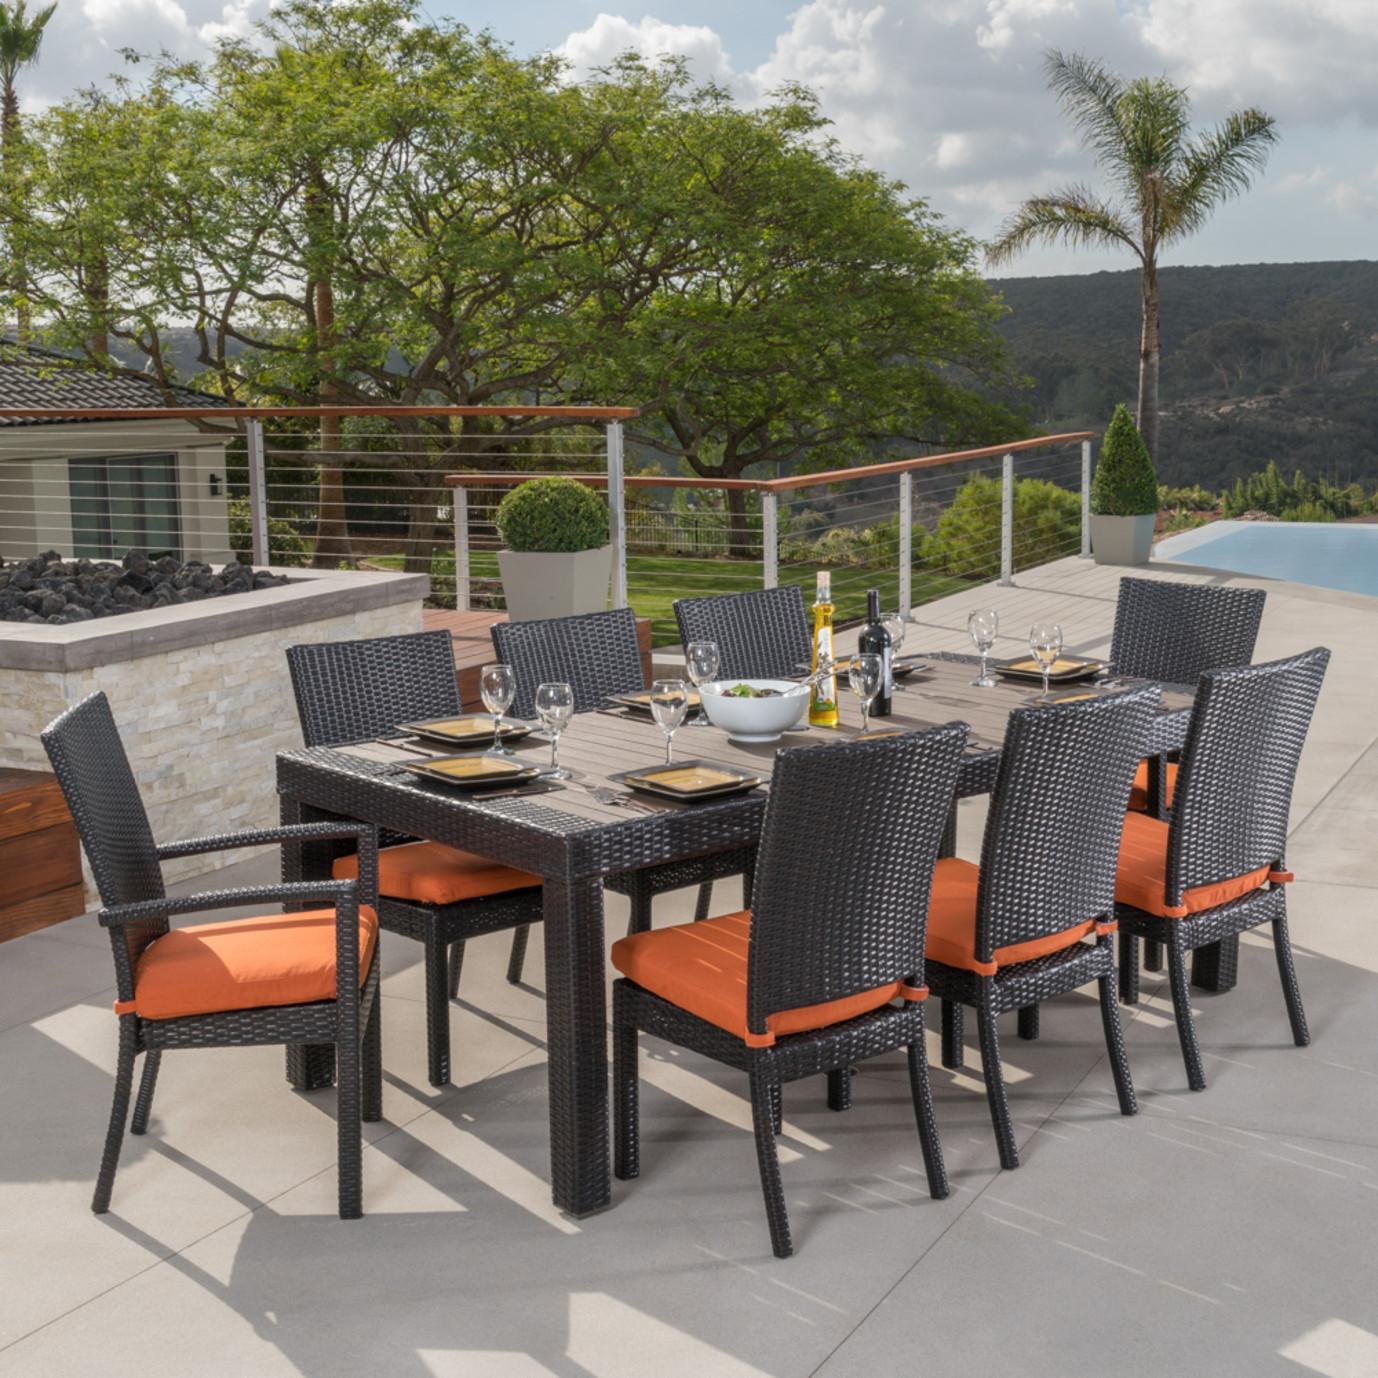 Deco™ 9pc Dining Set - Tikka Orange